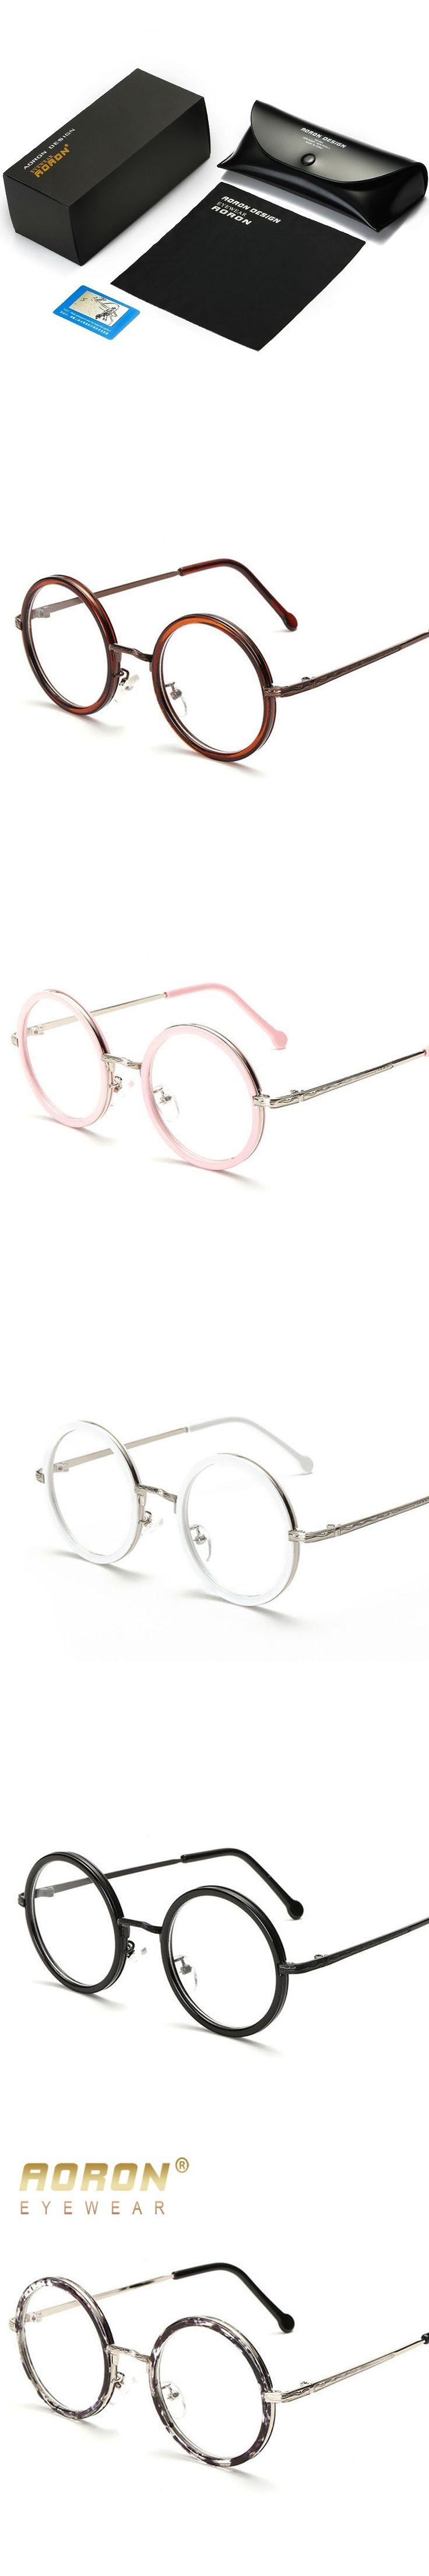 AORON Women's Round Glasses Retro Classic Unisex Teashd Circle Granny Glasses Oculos Accessoriesades Leisure Eyewear